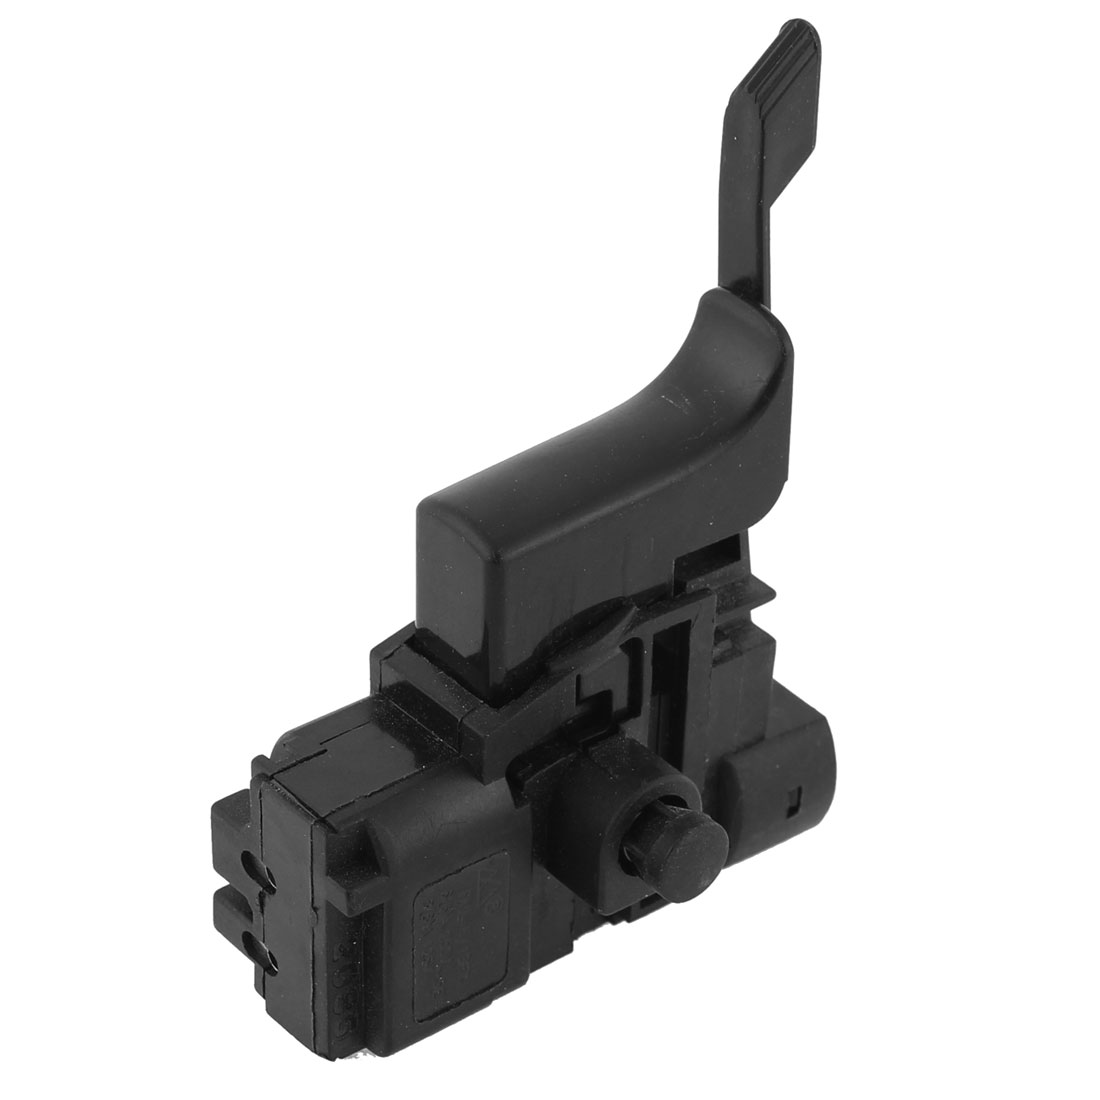 AC 250V 6A 125V 8A FA2-6/1BEK Rotary Hammer Power Tool Trigger Switch